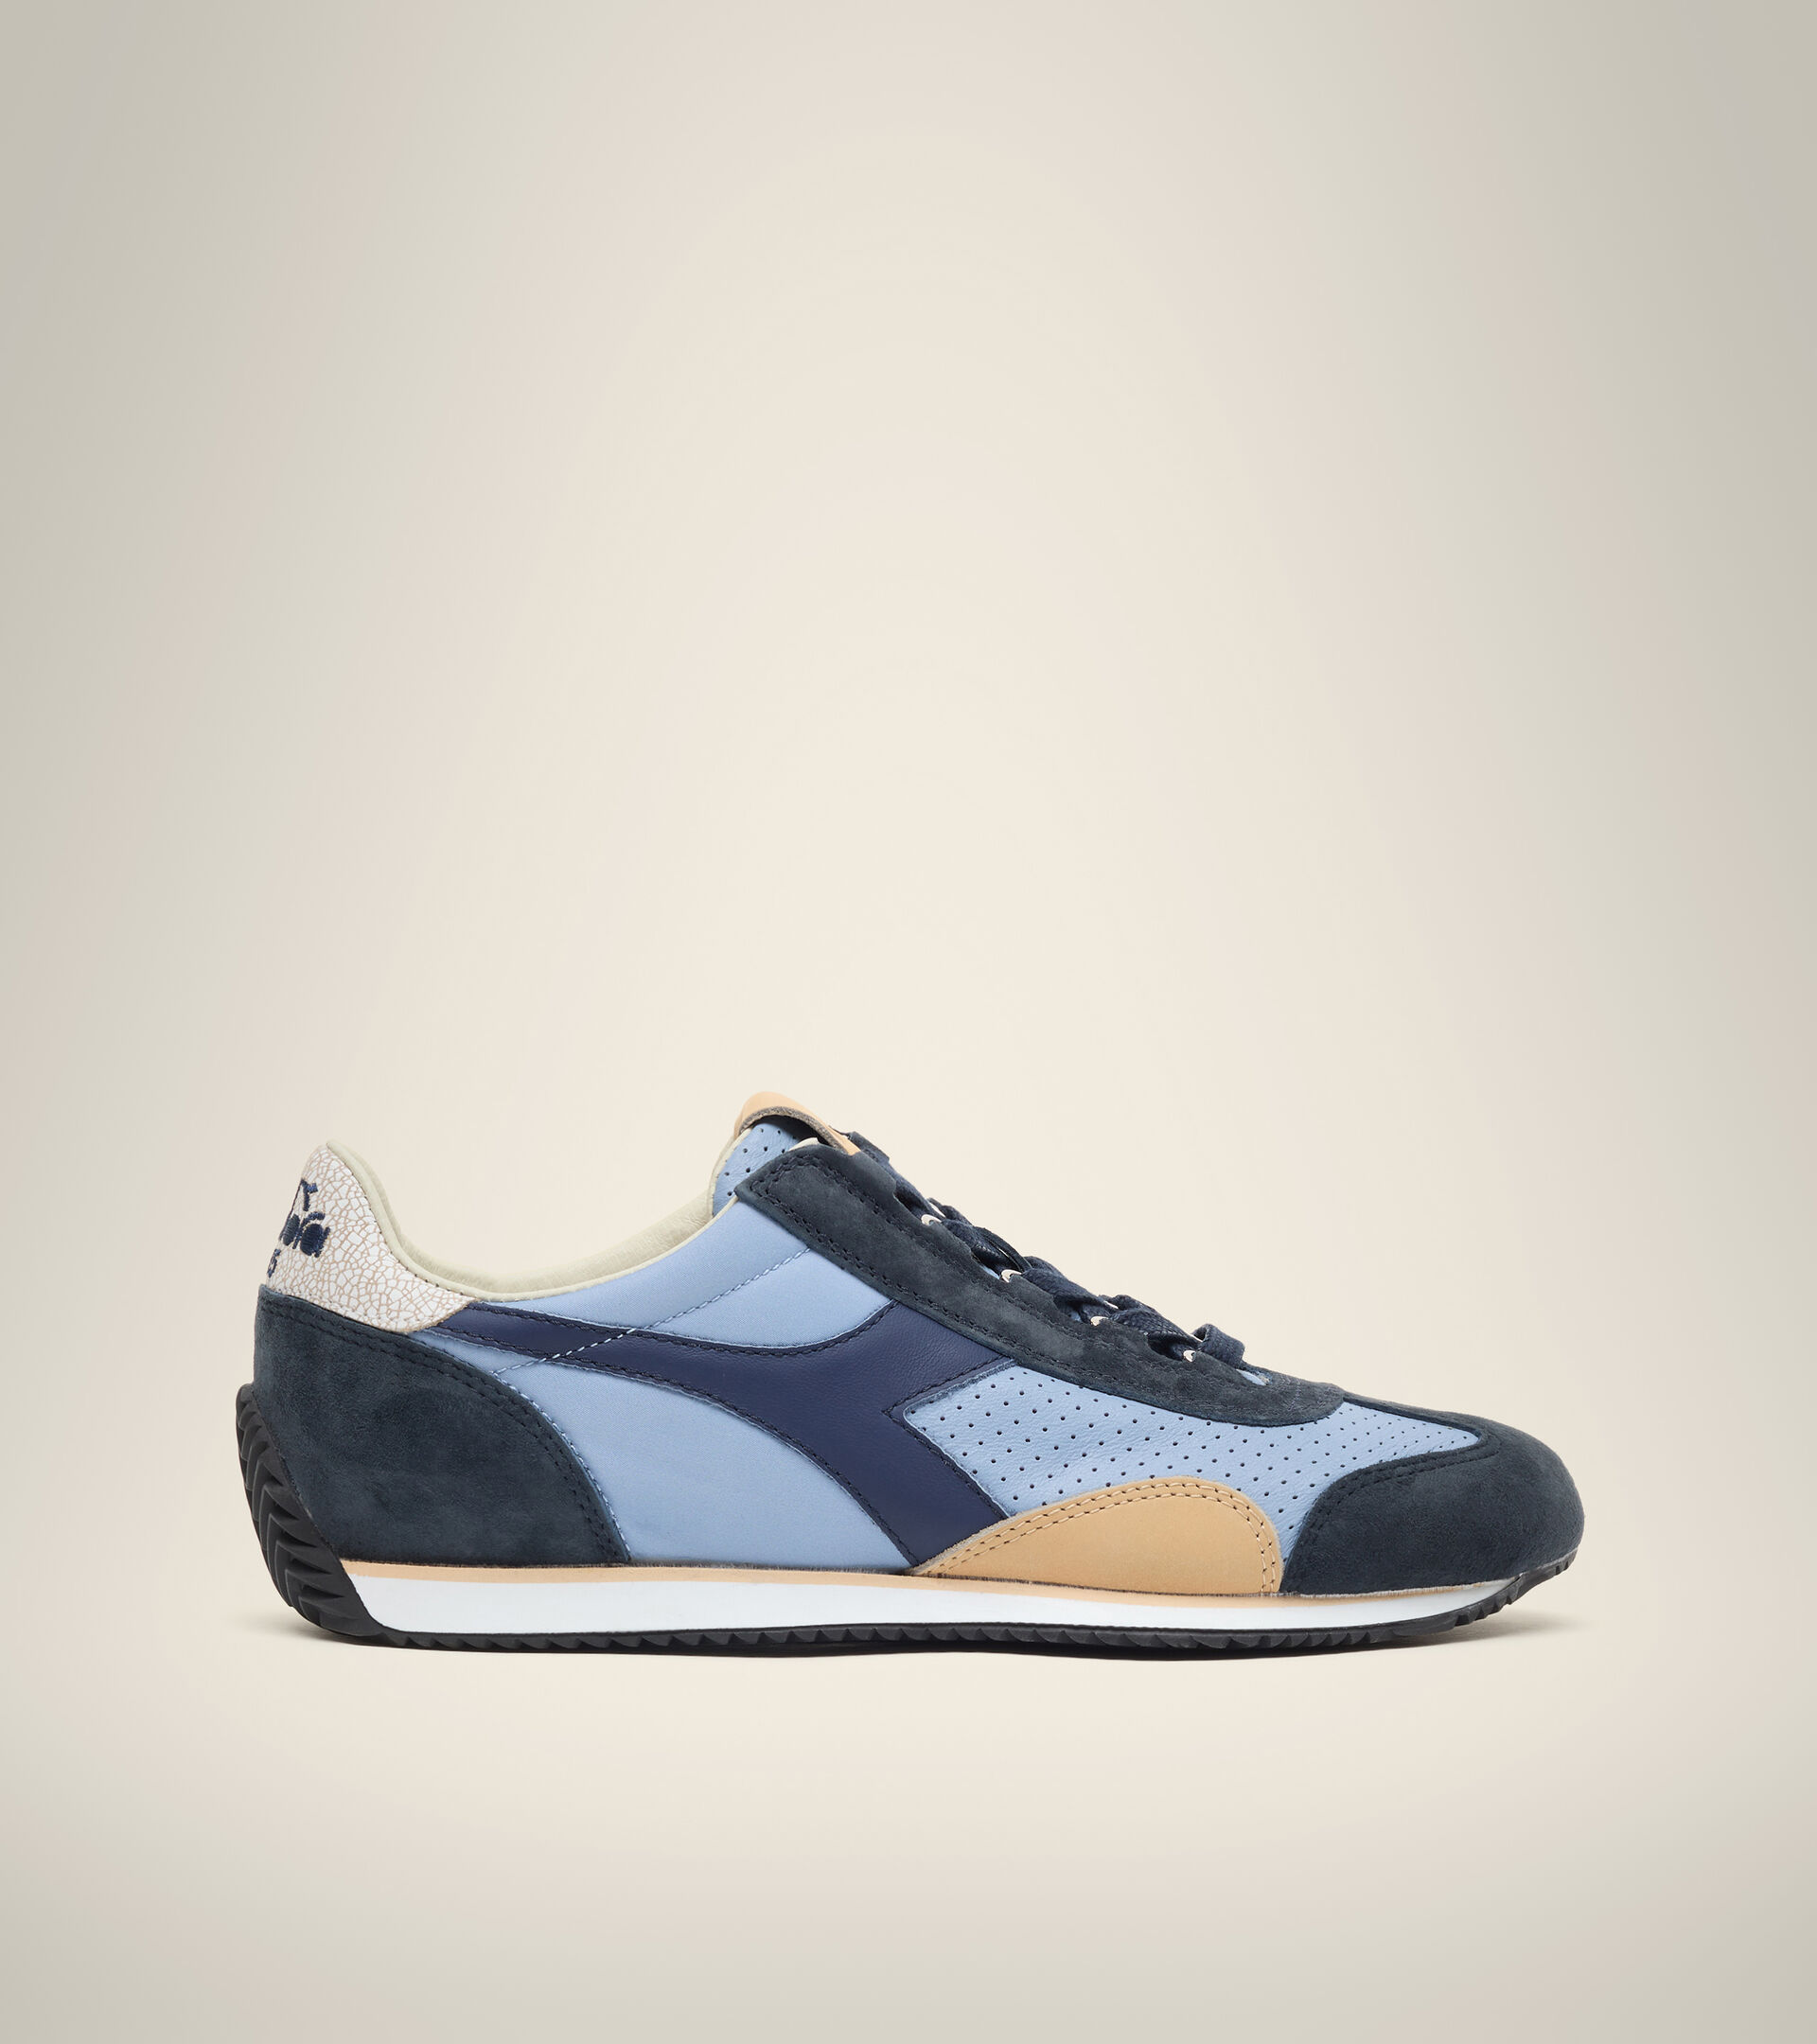 Footwear Heritage UOMO EQUIPE ITALIA BLU DENIM SBIADITO Diadora